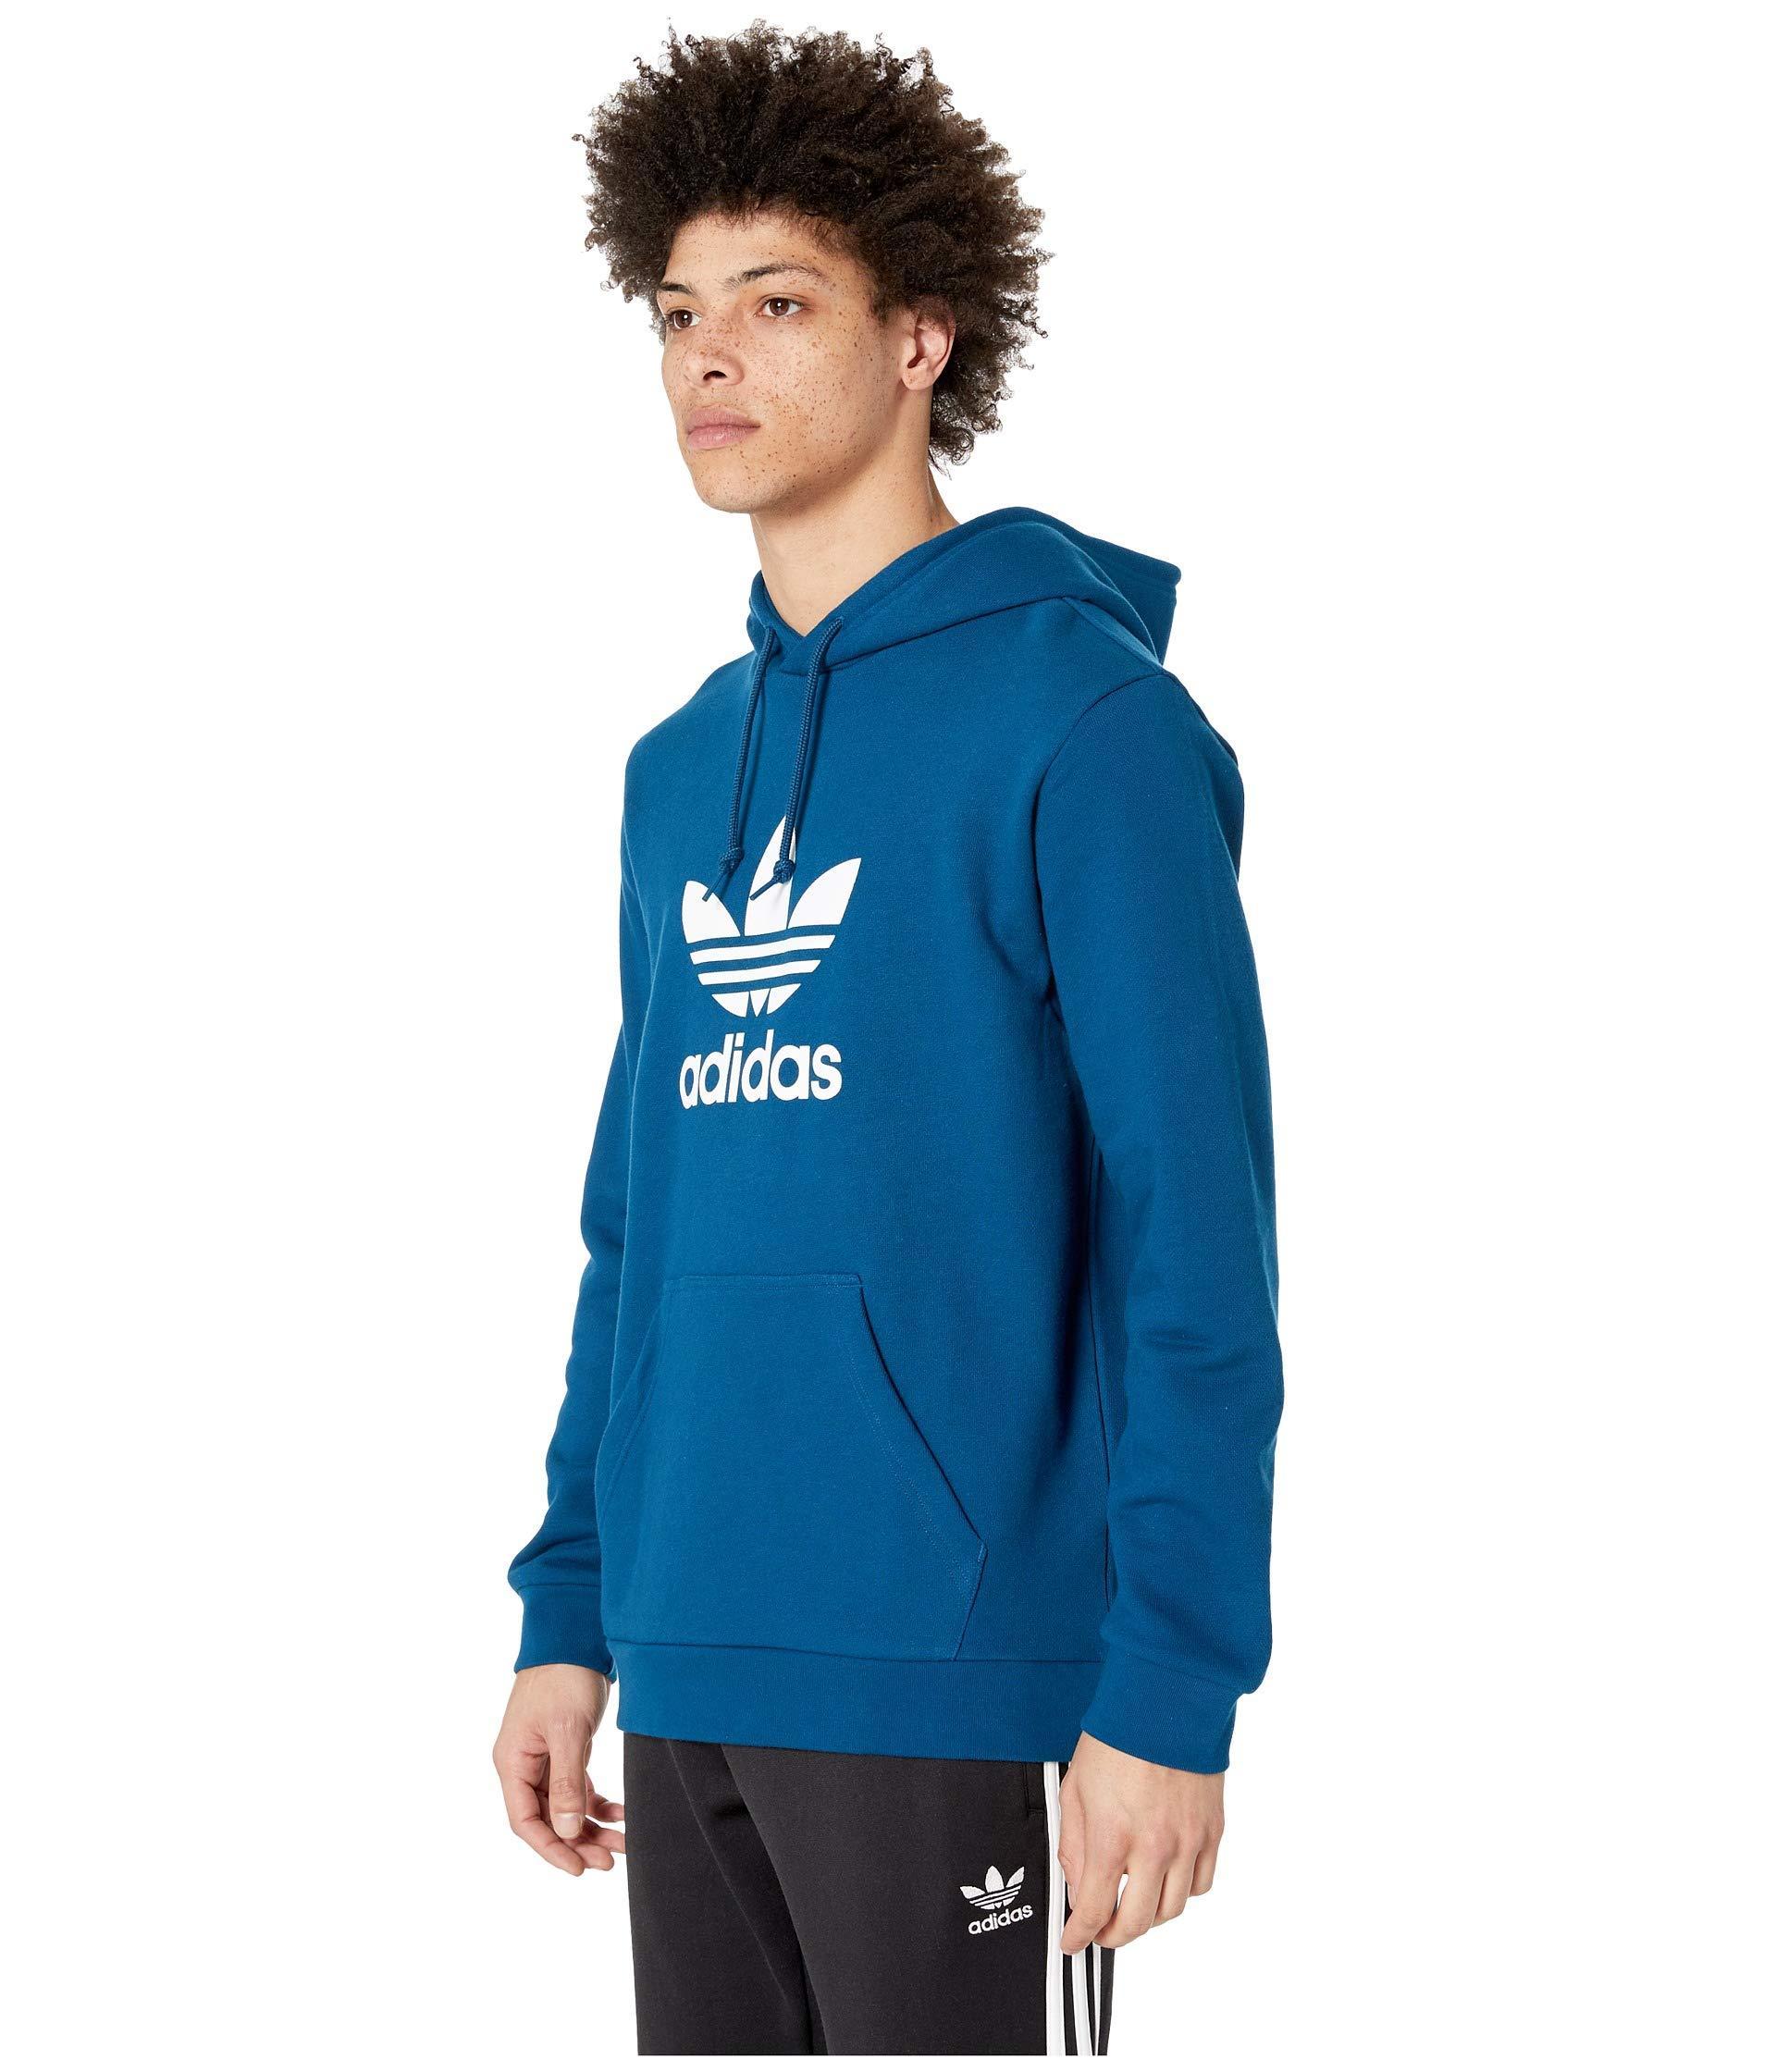 new product abe5e 71011 Lyst - adidas Originals Trefoil Hoodie (medium Grey Heather) Men s  Sweatshirt in Blue for Men